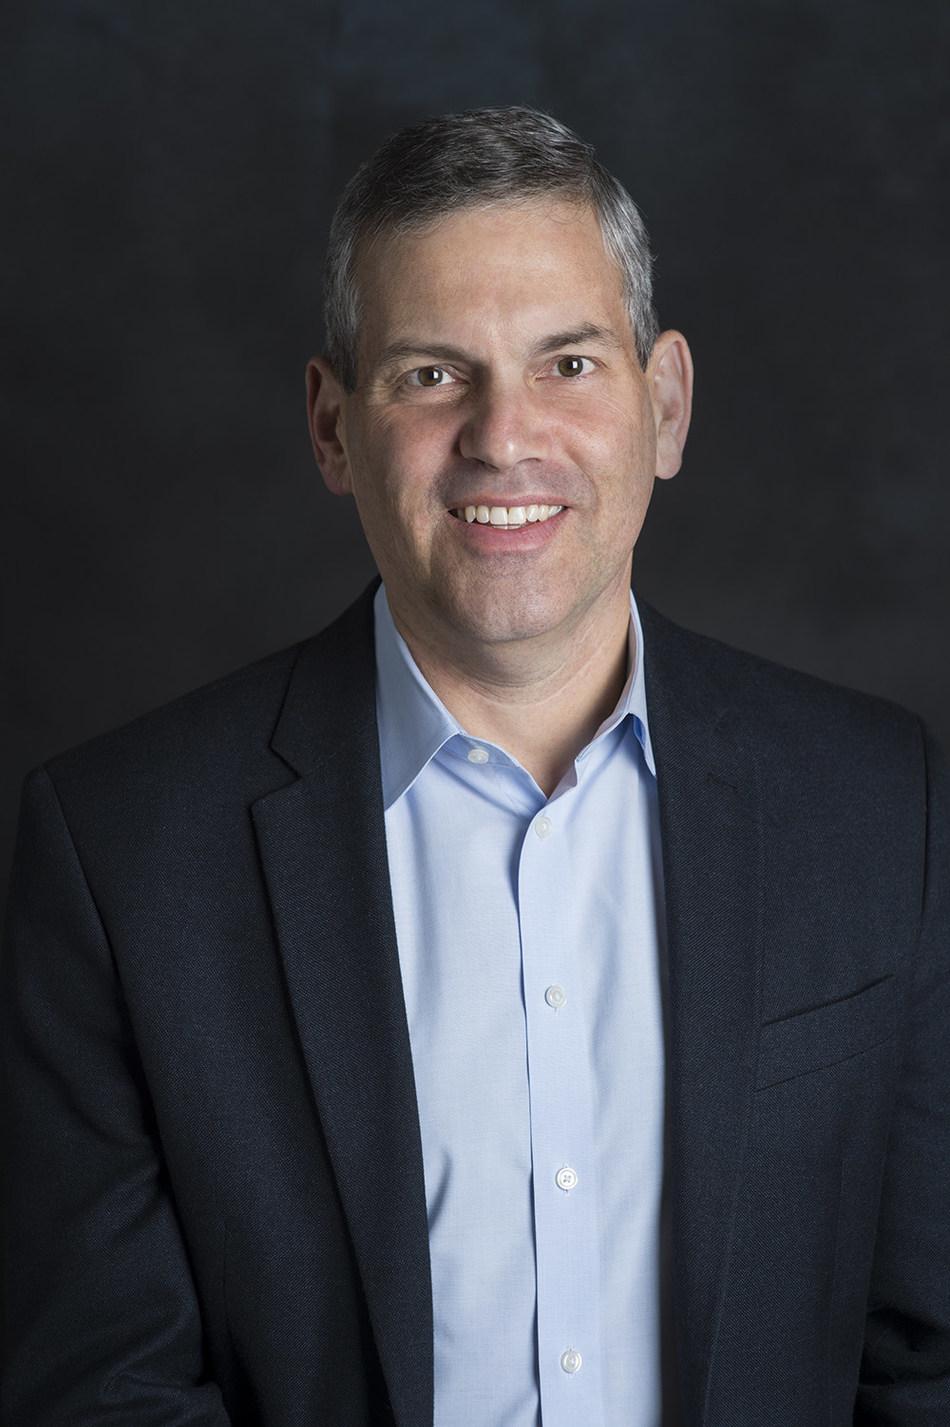 Mark Mathews Vice President, North America Commercial Marketing, Epson America